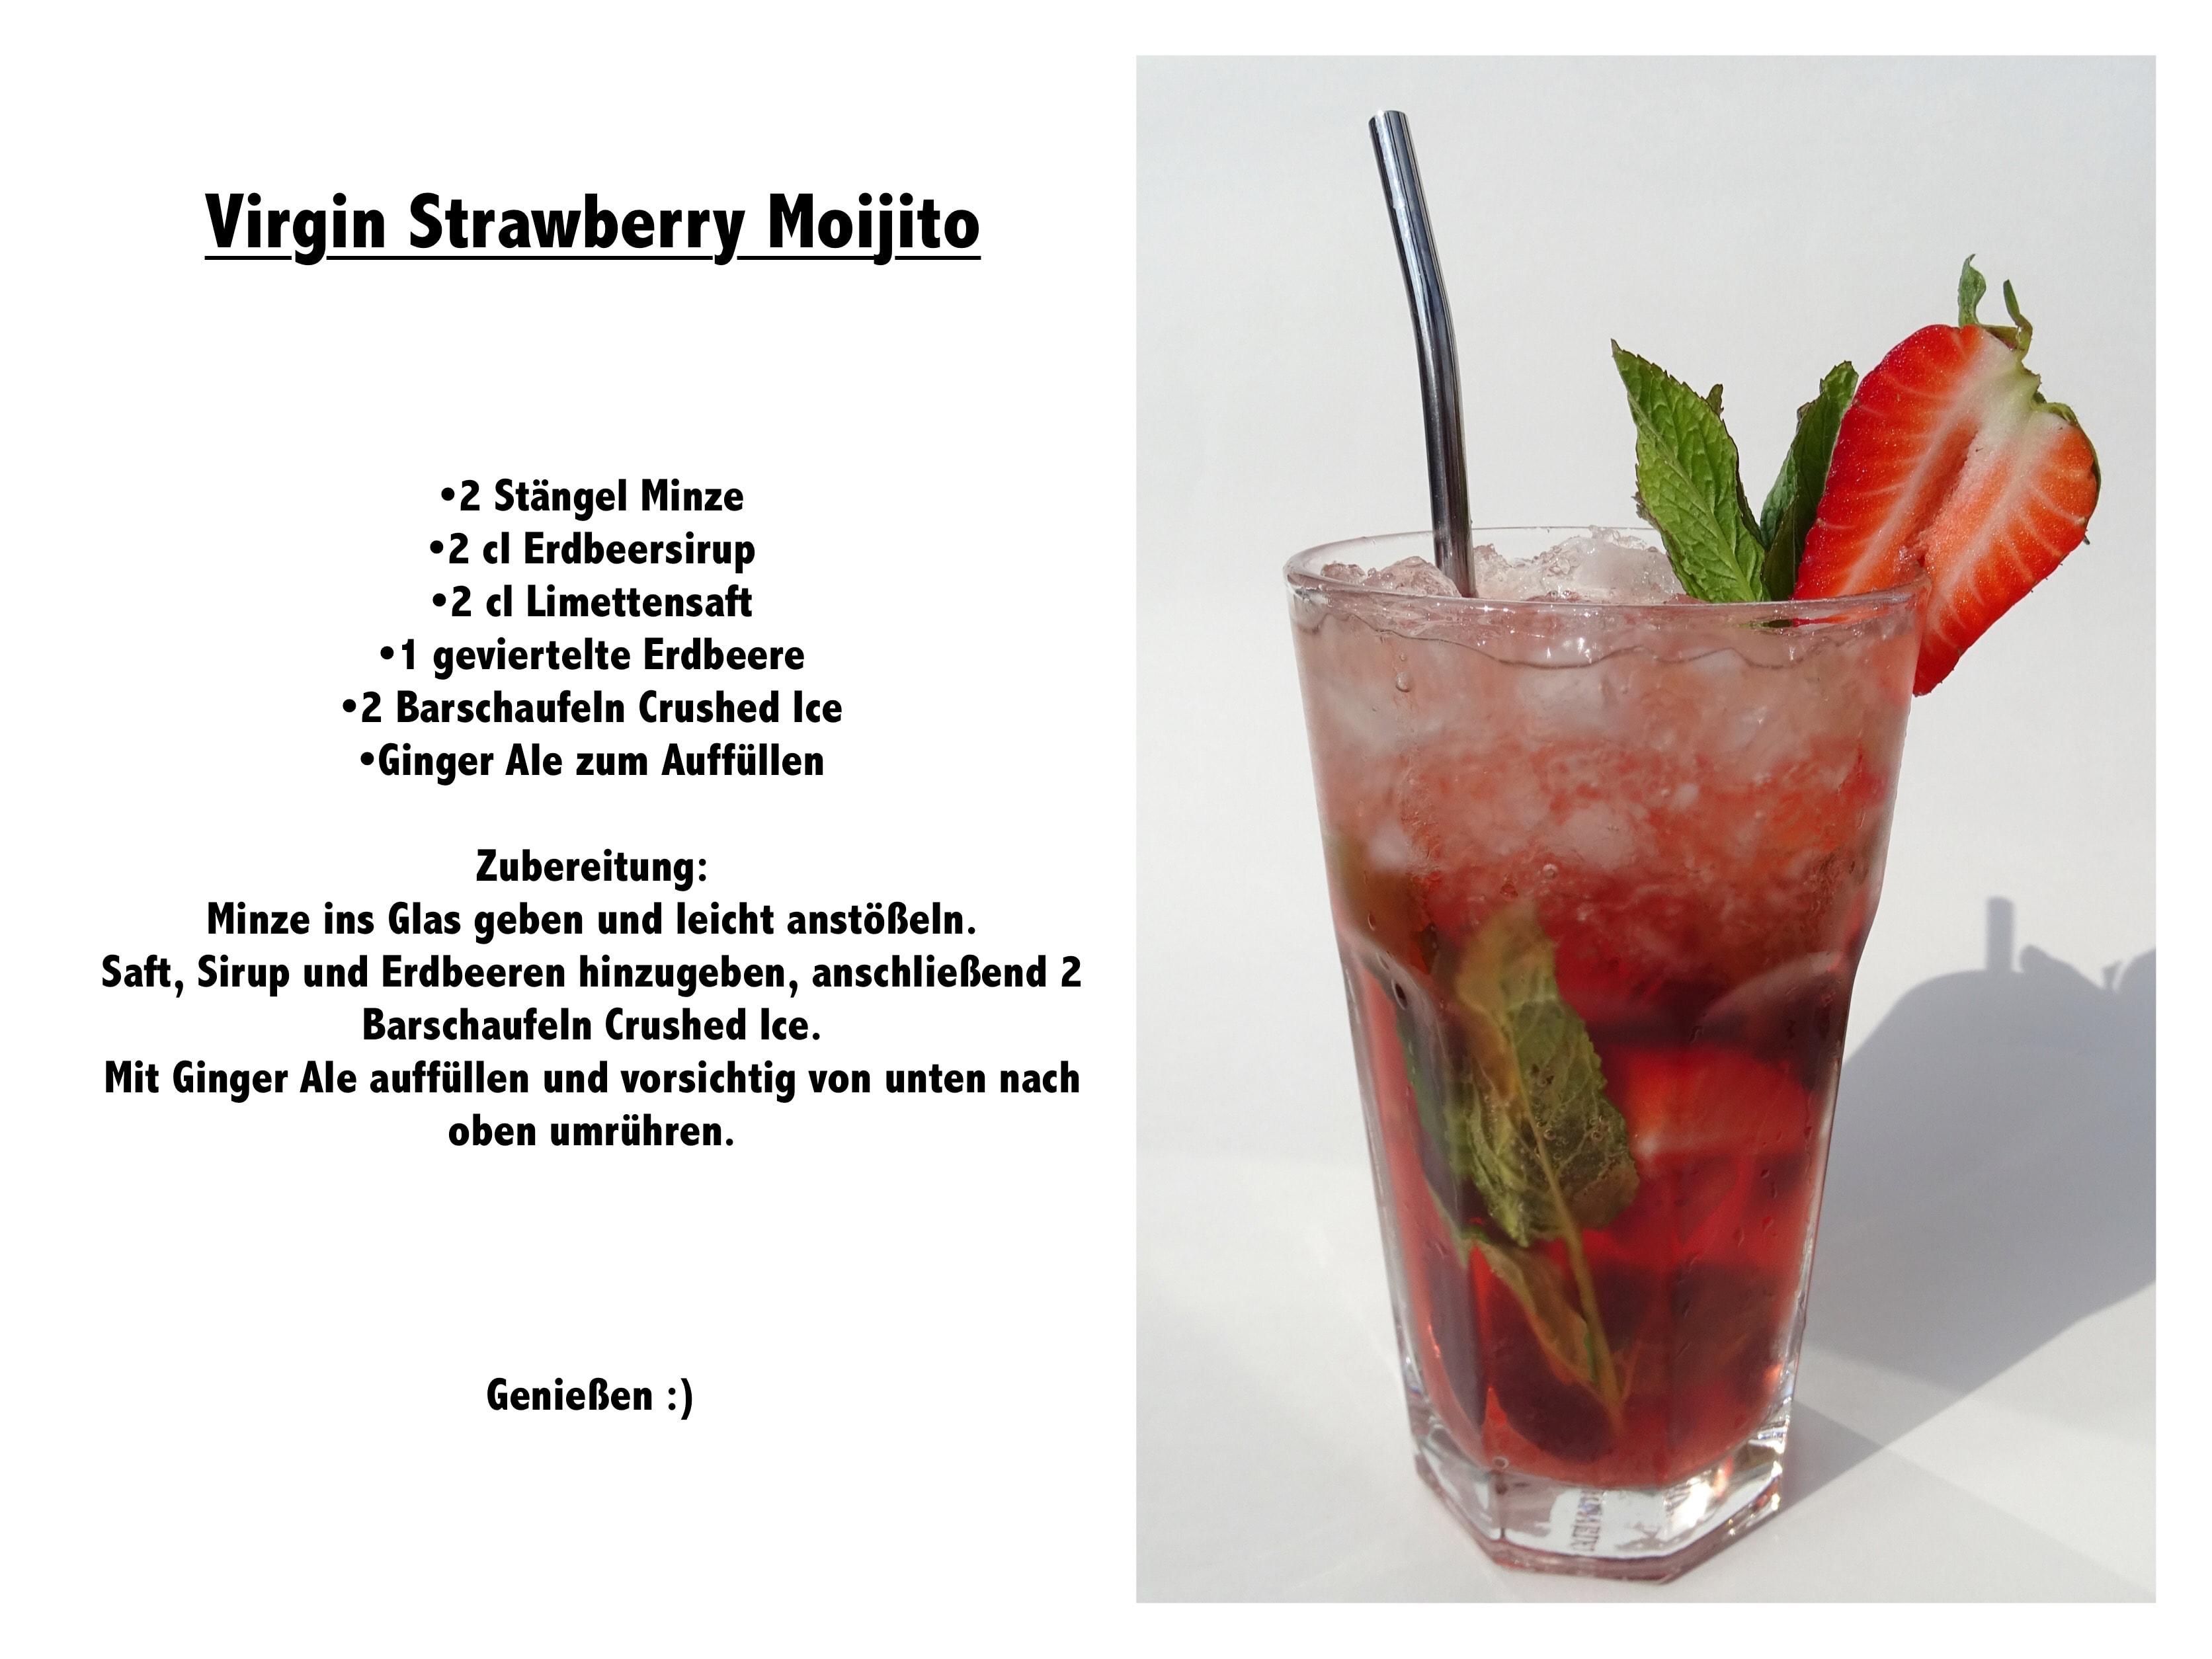 Alkoholfreie Mixgetränke mit Erdbeere - Carl Tode Göttingen